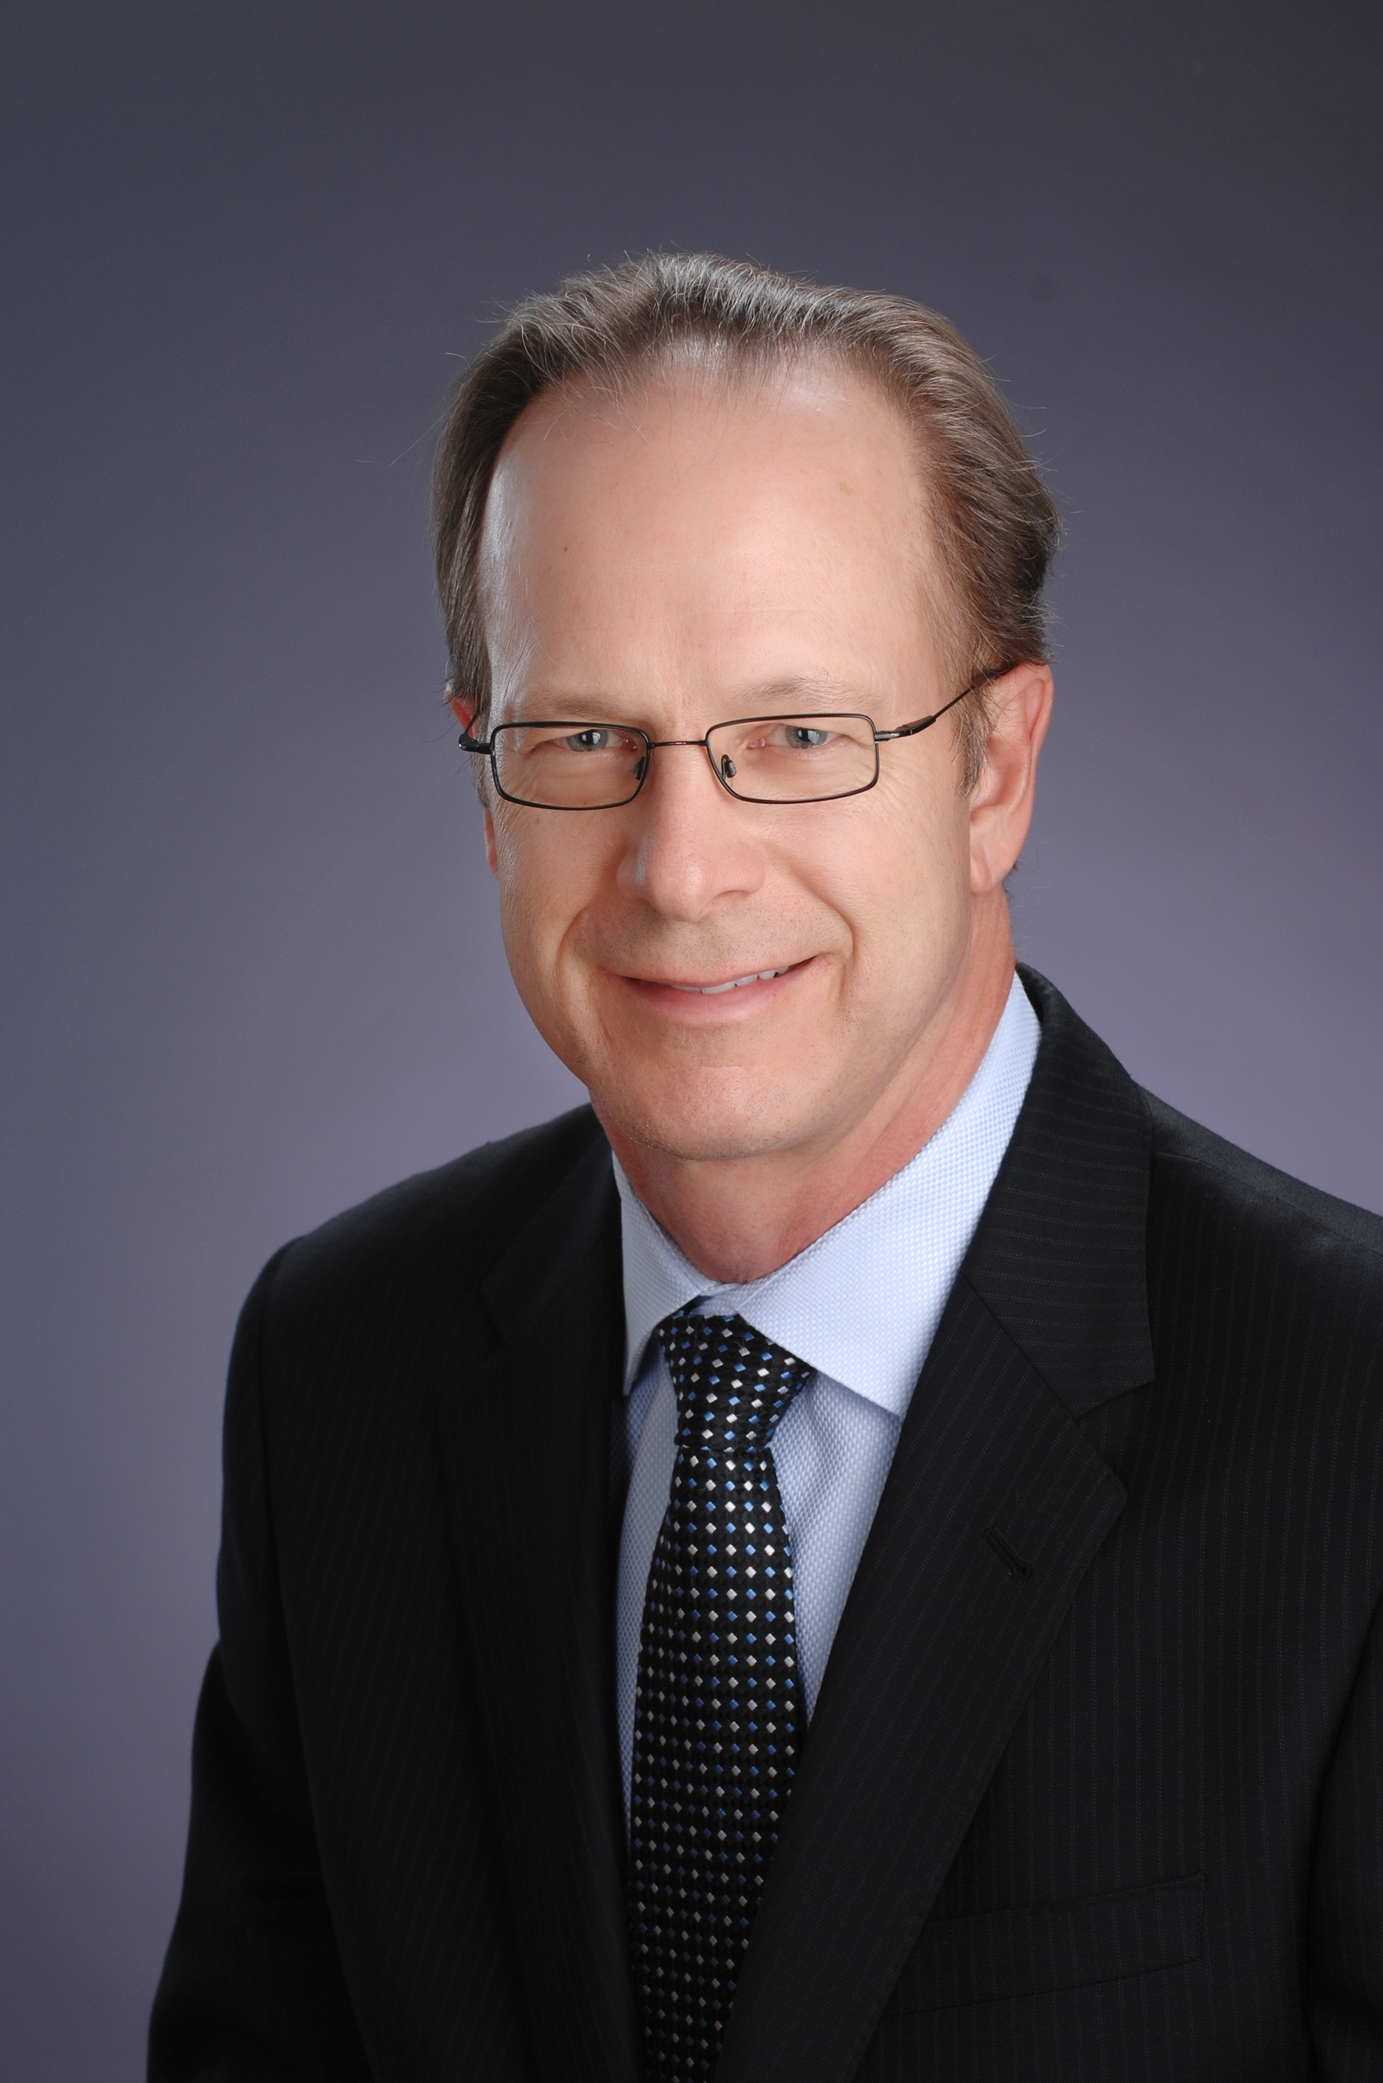 Craig Colville, MD